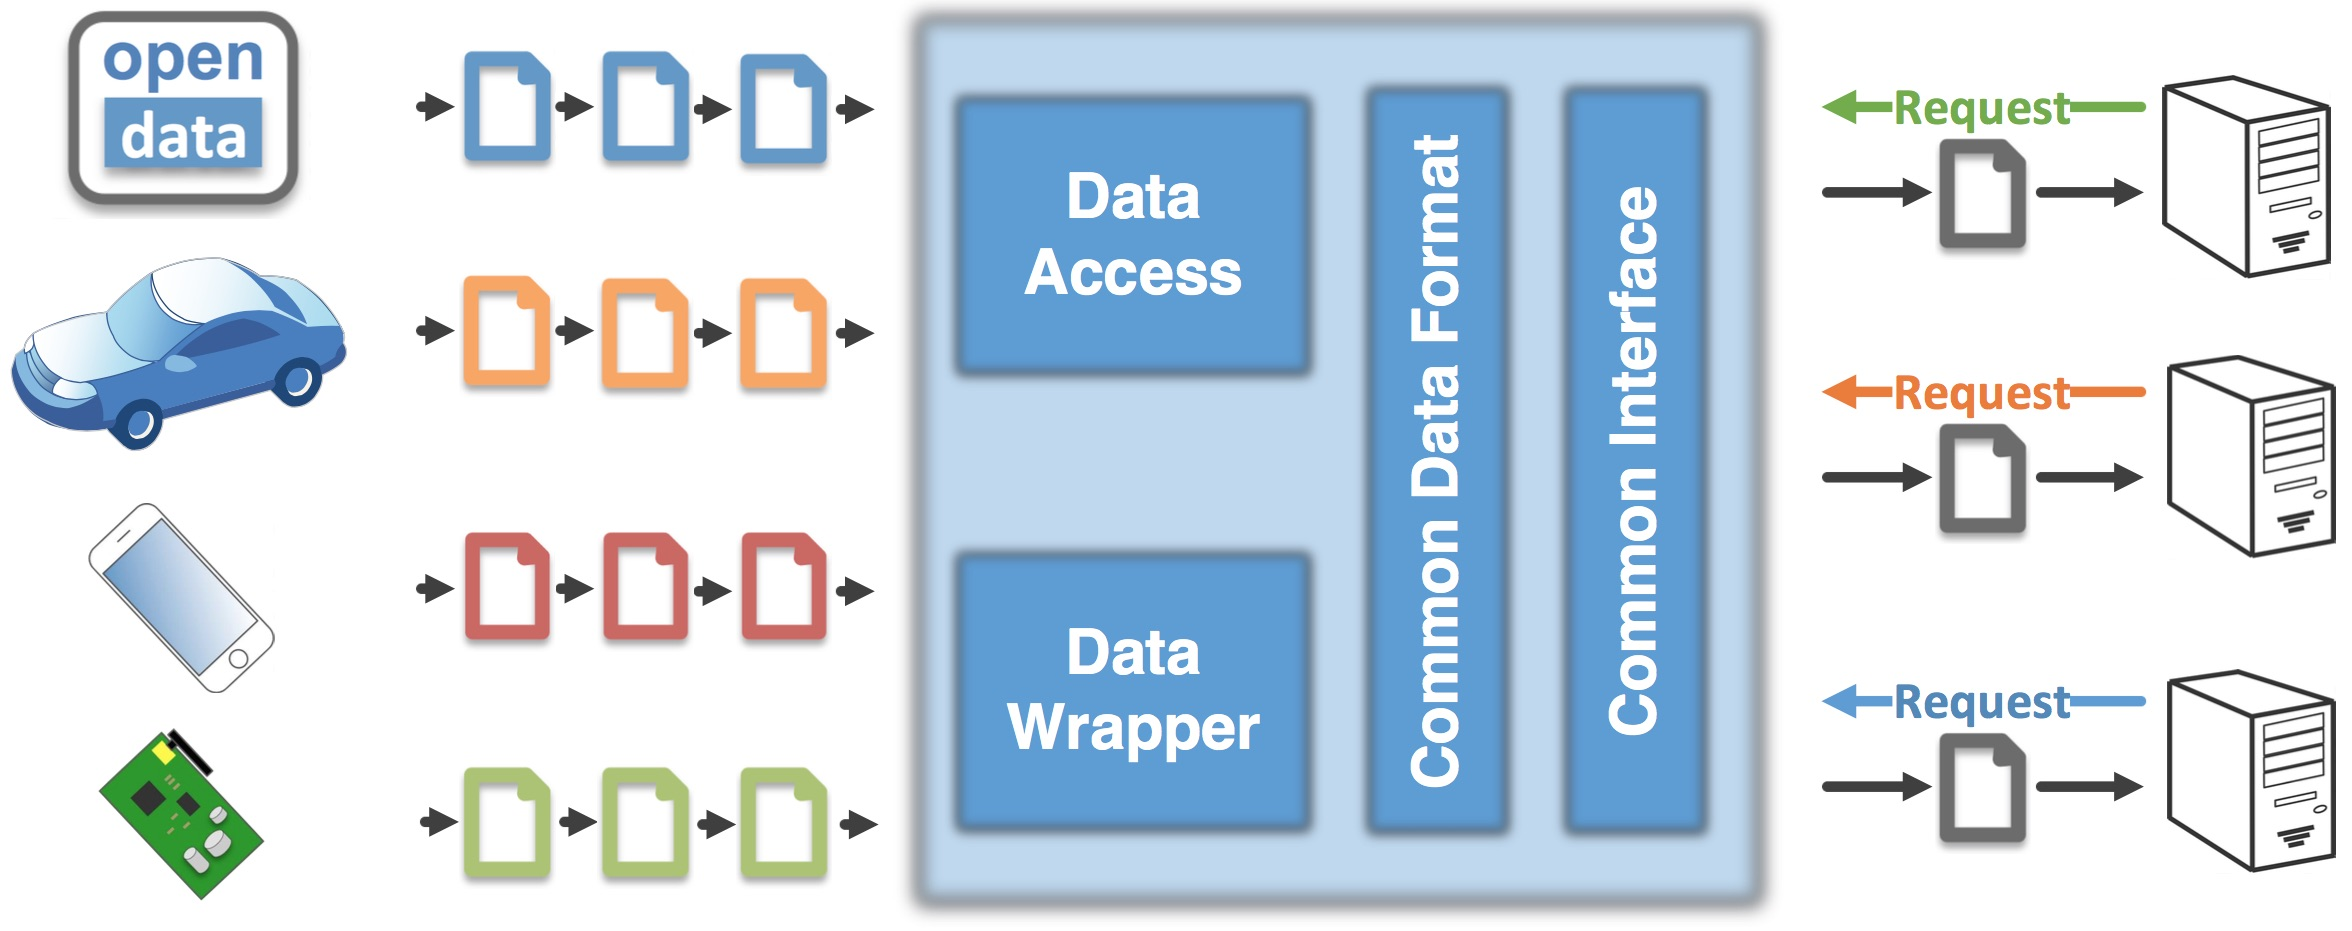 vm_common_data_access